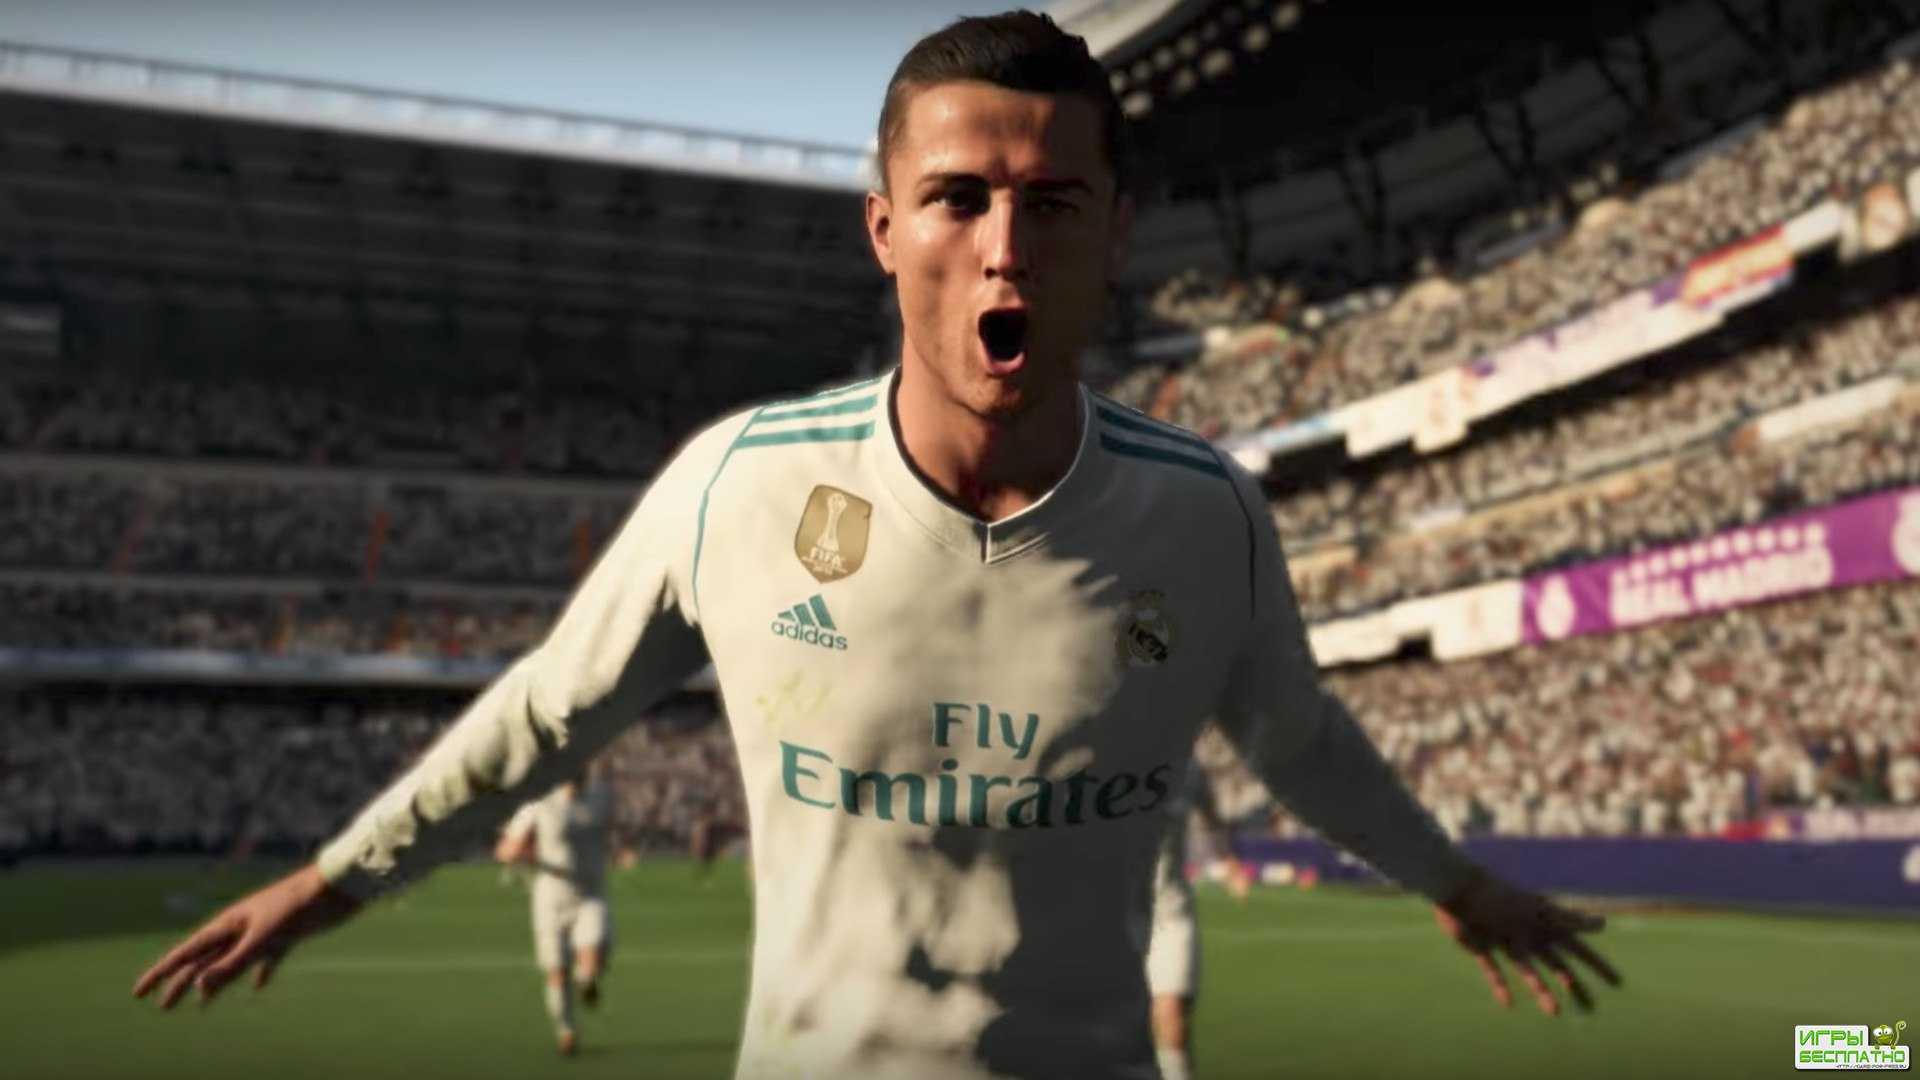 Фанаты FIFA 18 хотят удаления микротранзакций